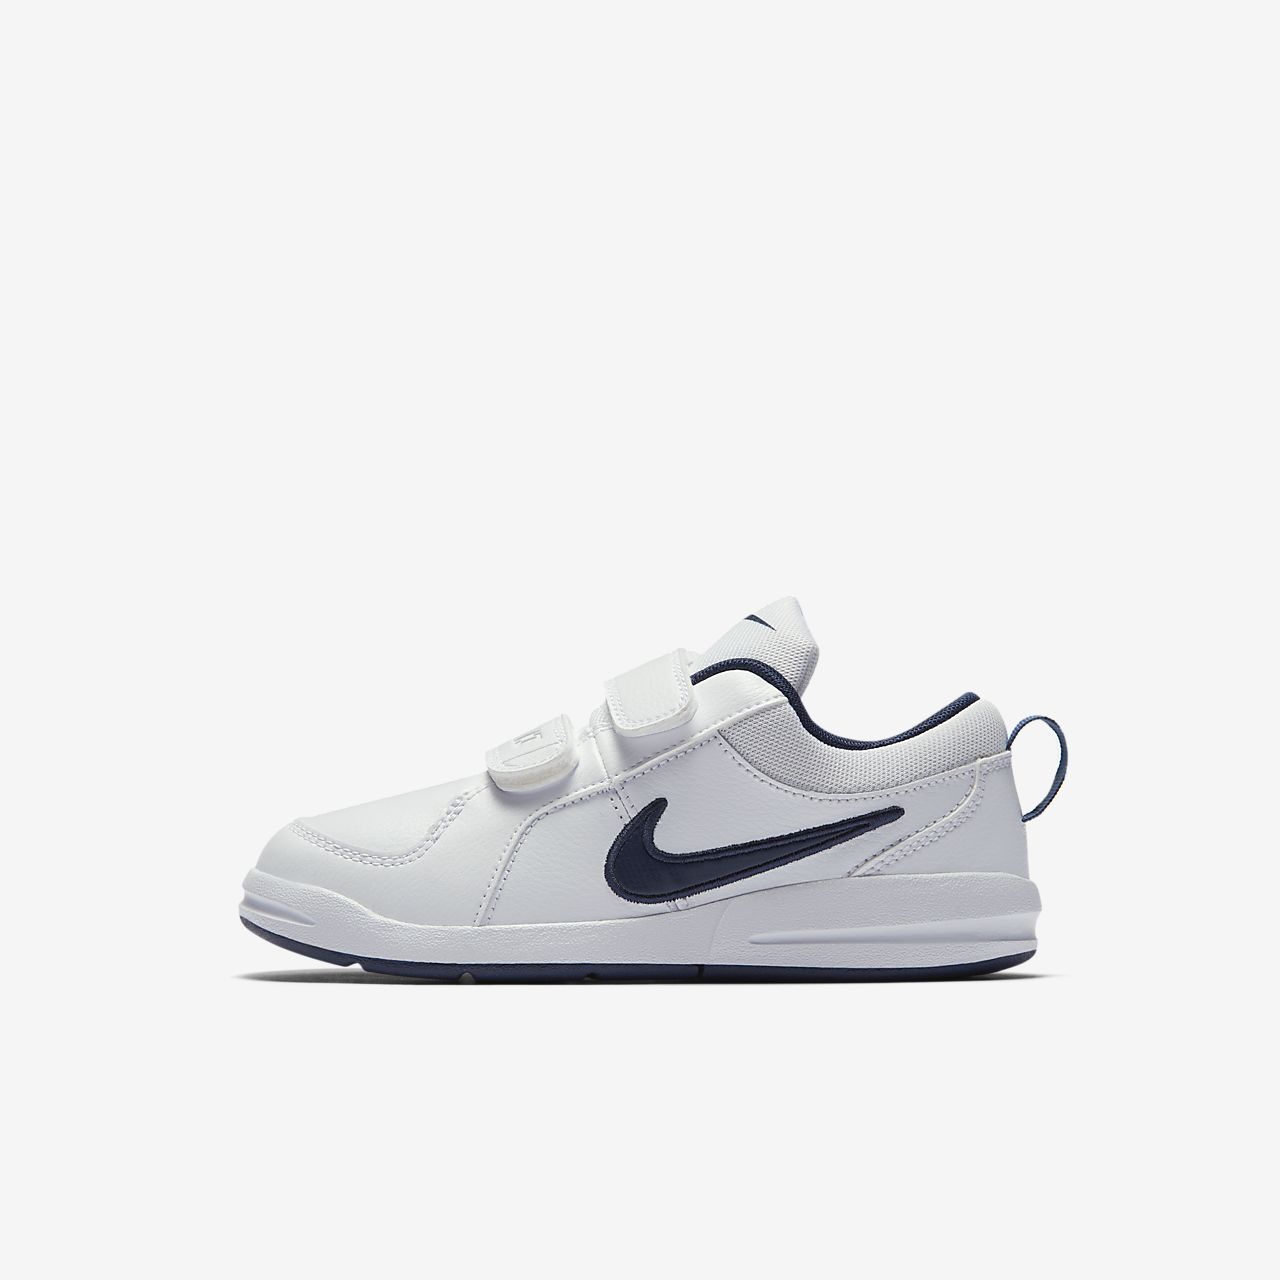 Sko Nike Pico 4 för barn